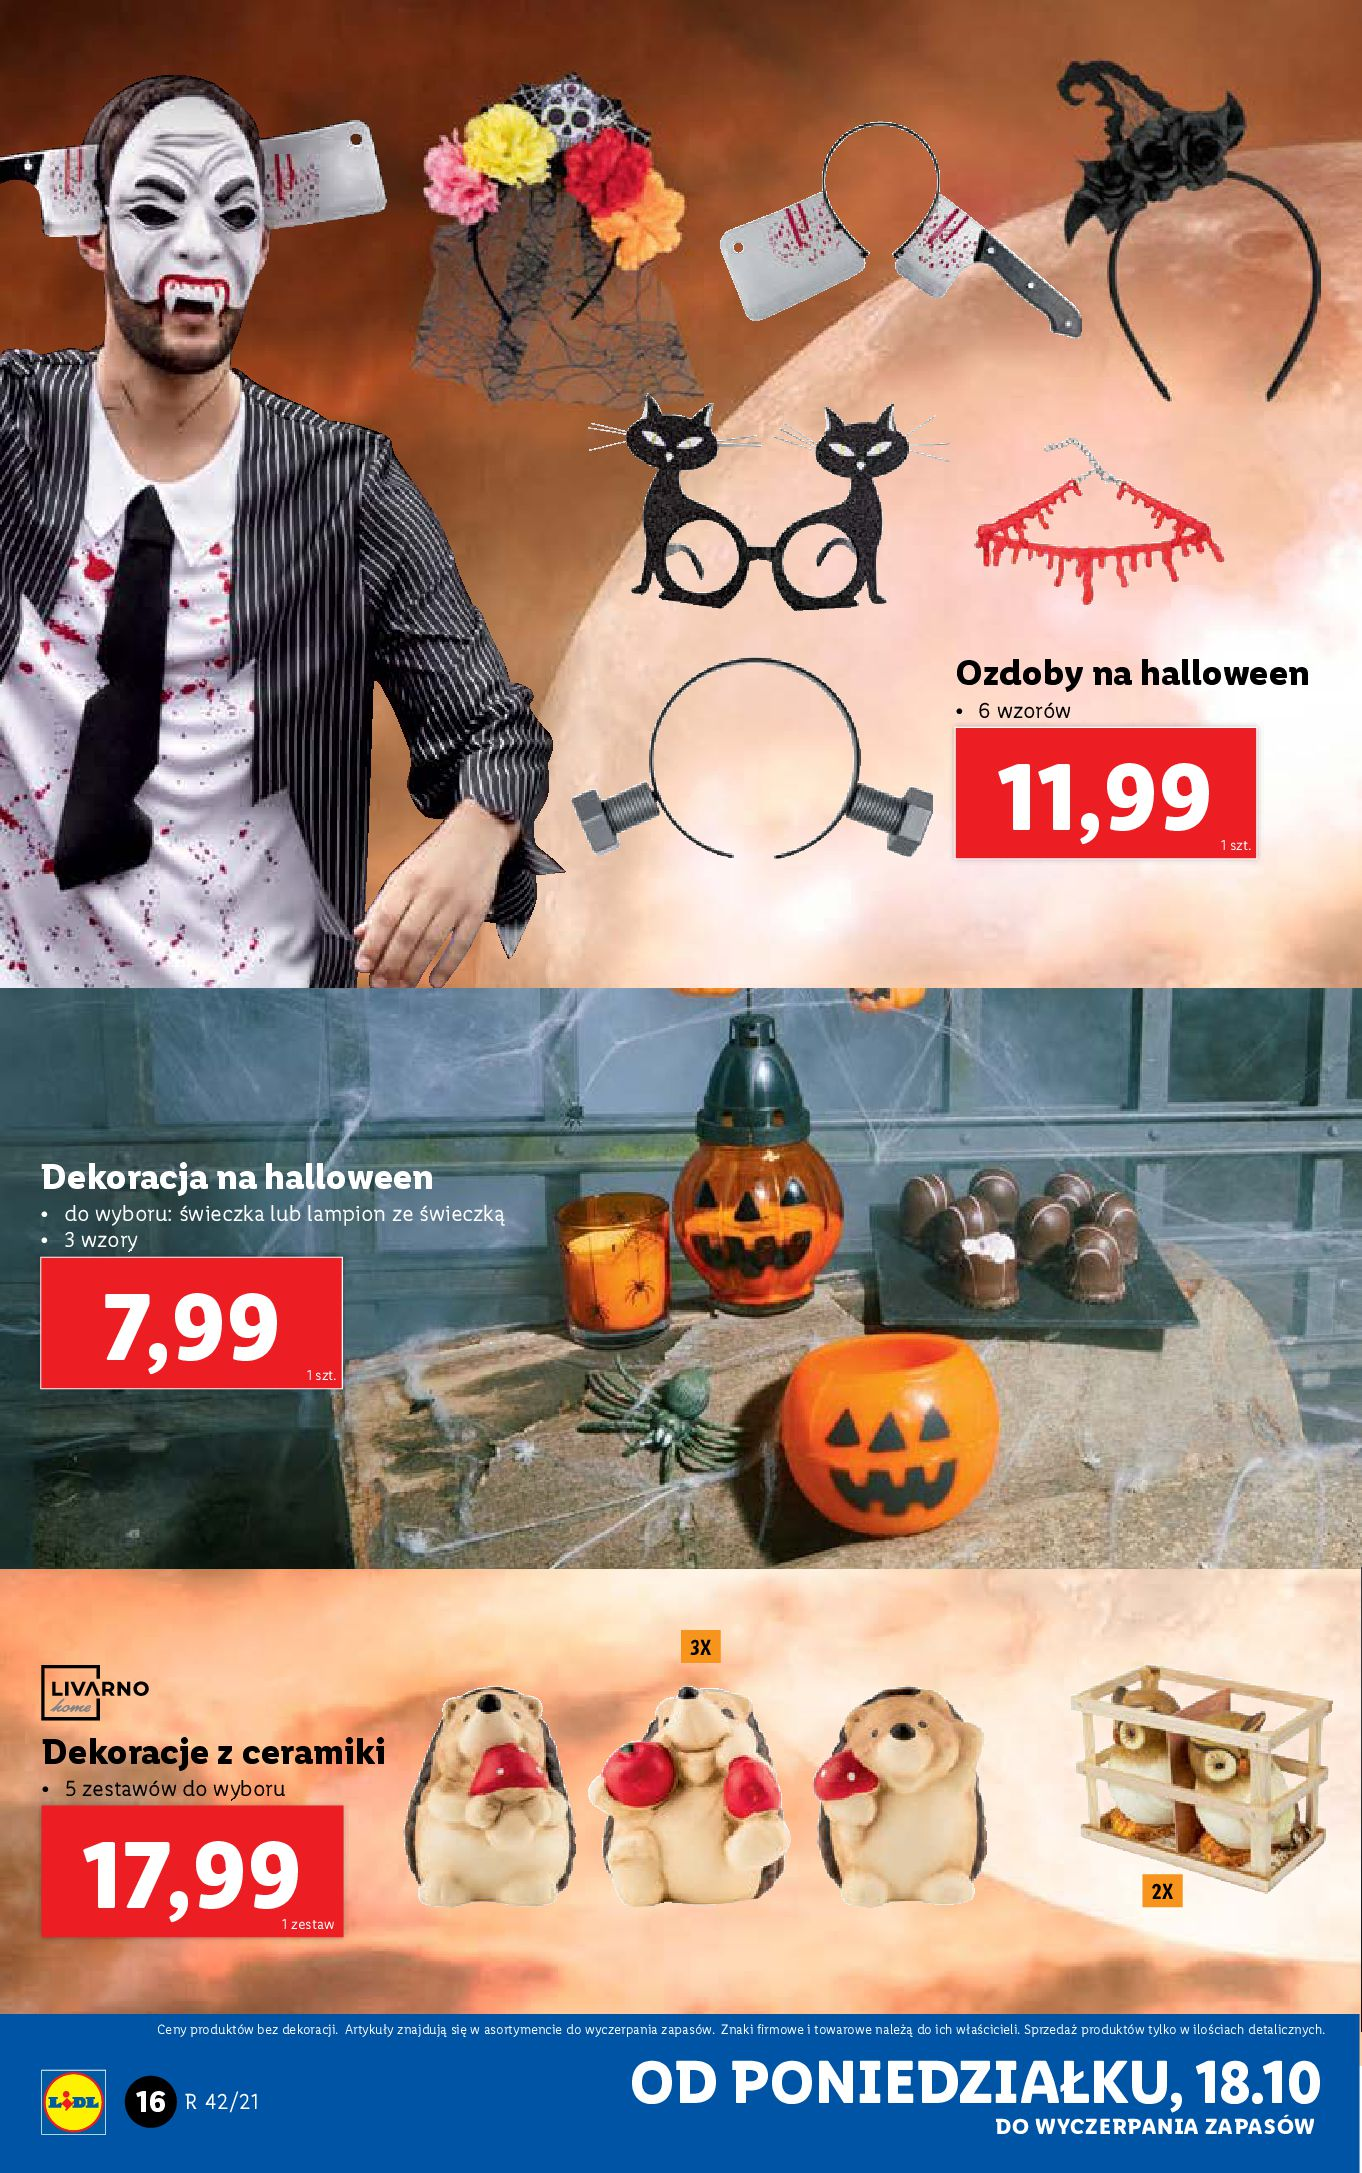 Gazetka Lidl: Gazetka Lidl - katalog 18-24.10. 2021-10-18 page-16